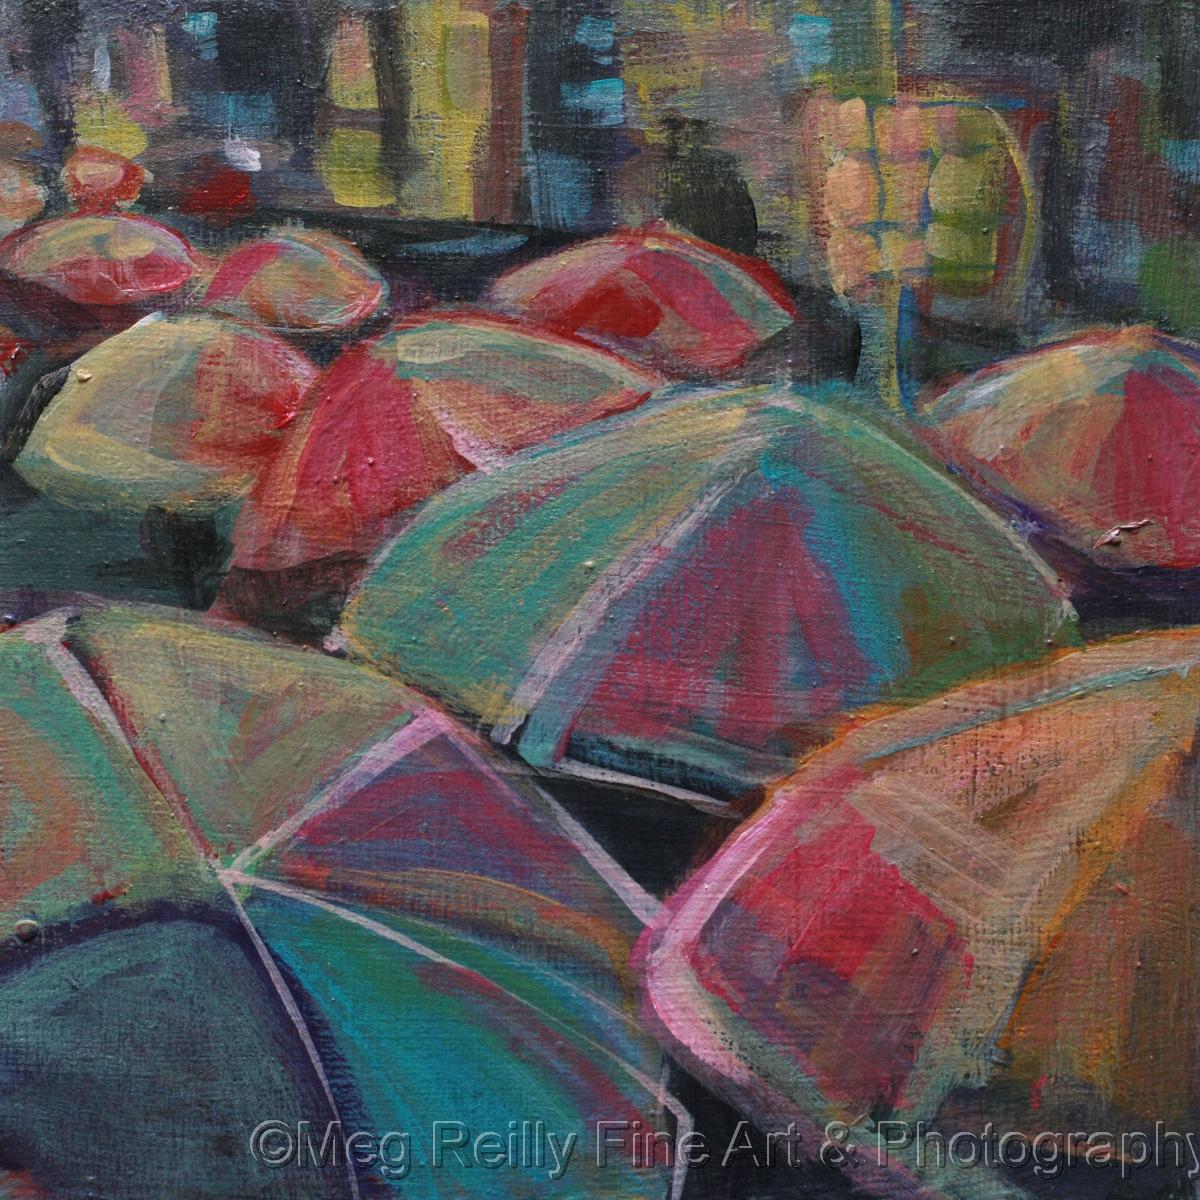 Umbrella Revolution #331 (large view)